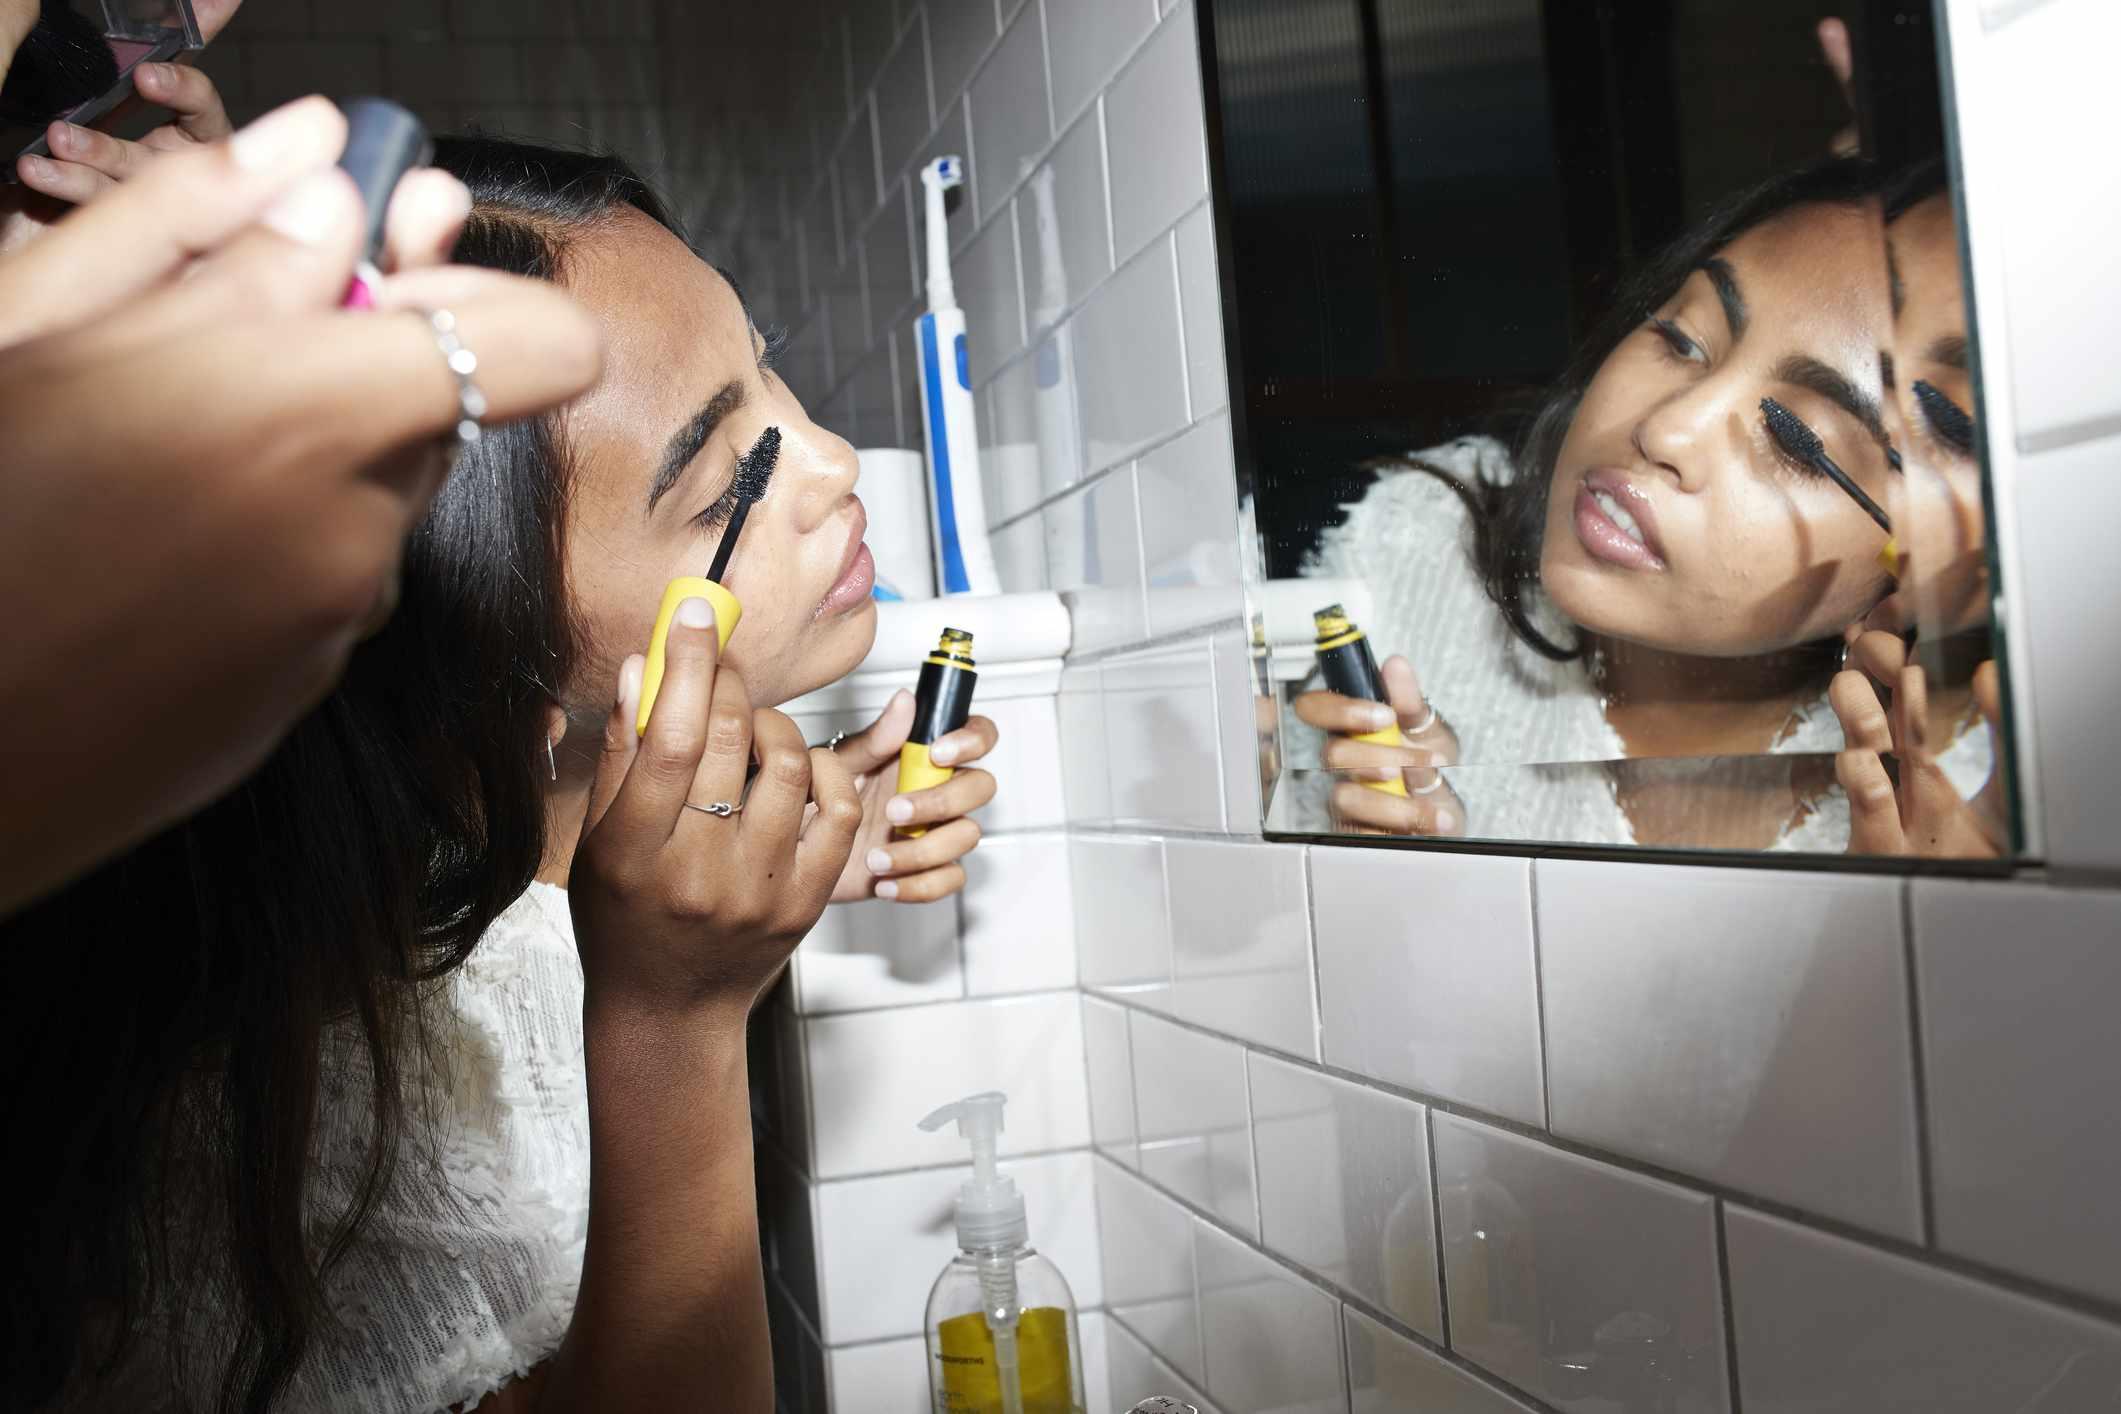 A young Asian woman applies mascara in the mirror.